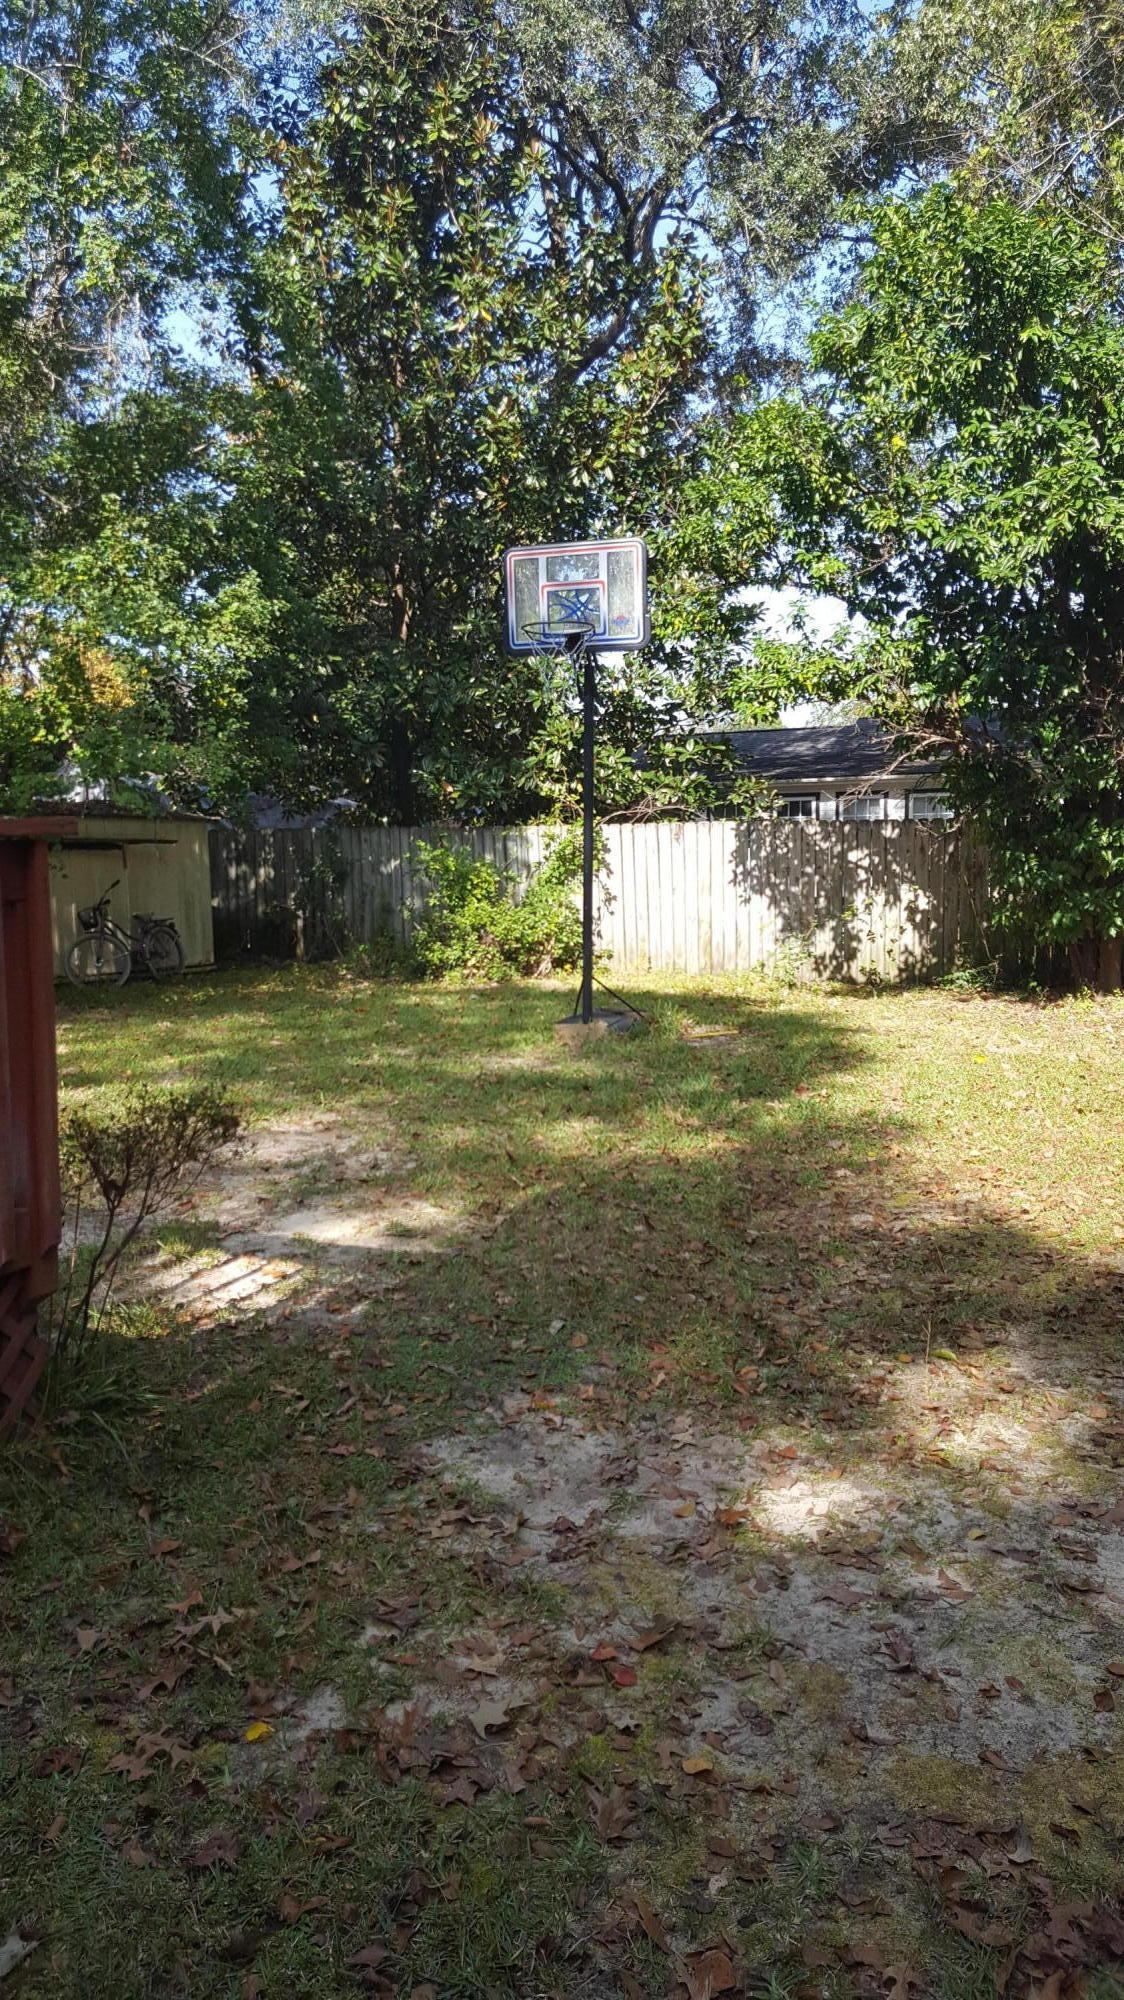 Pepperhill Homes For Sale - 7640 Hillandale, North Charleston, SC - 0